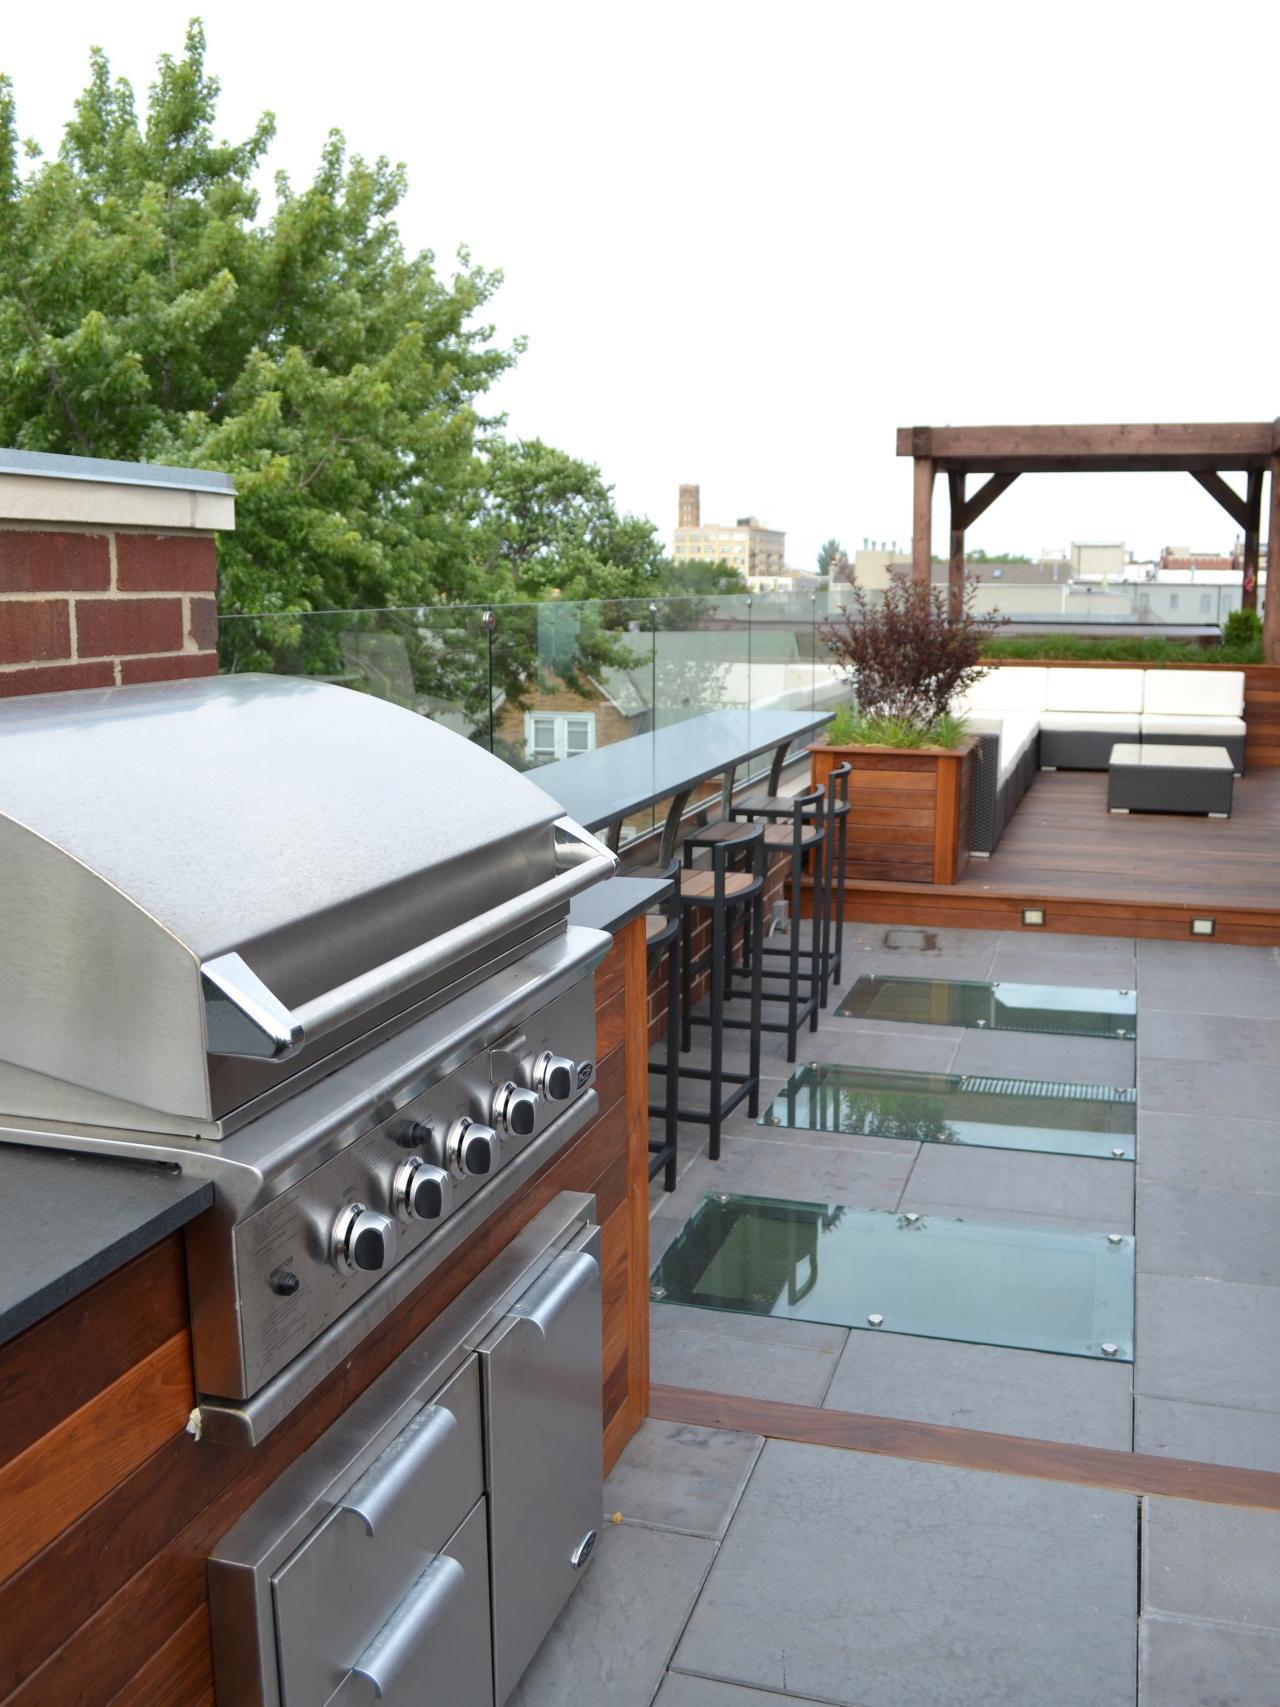 Outdoor Kitchen Design Ideas: Pictures, Tips & Expert Advice | HGTV